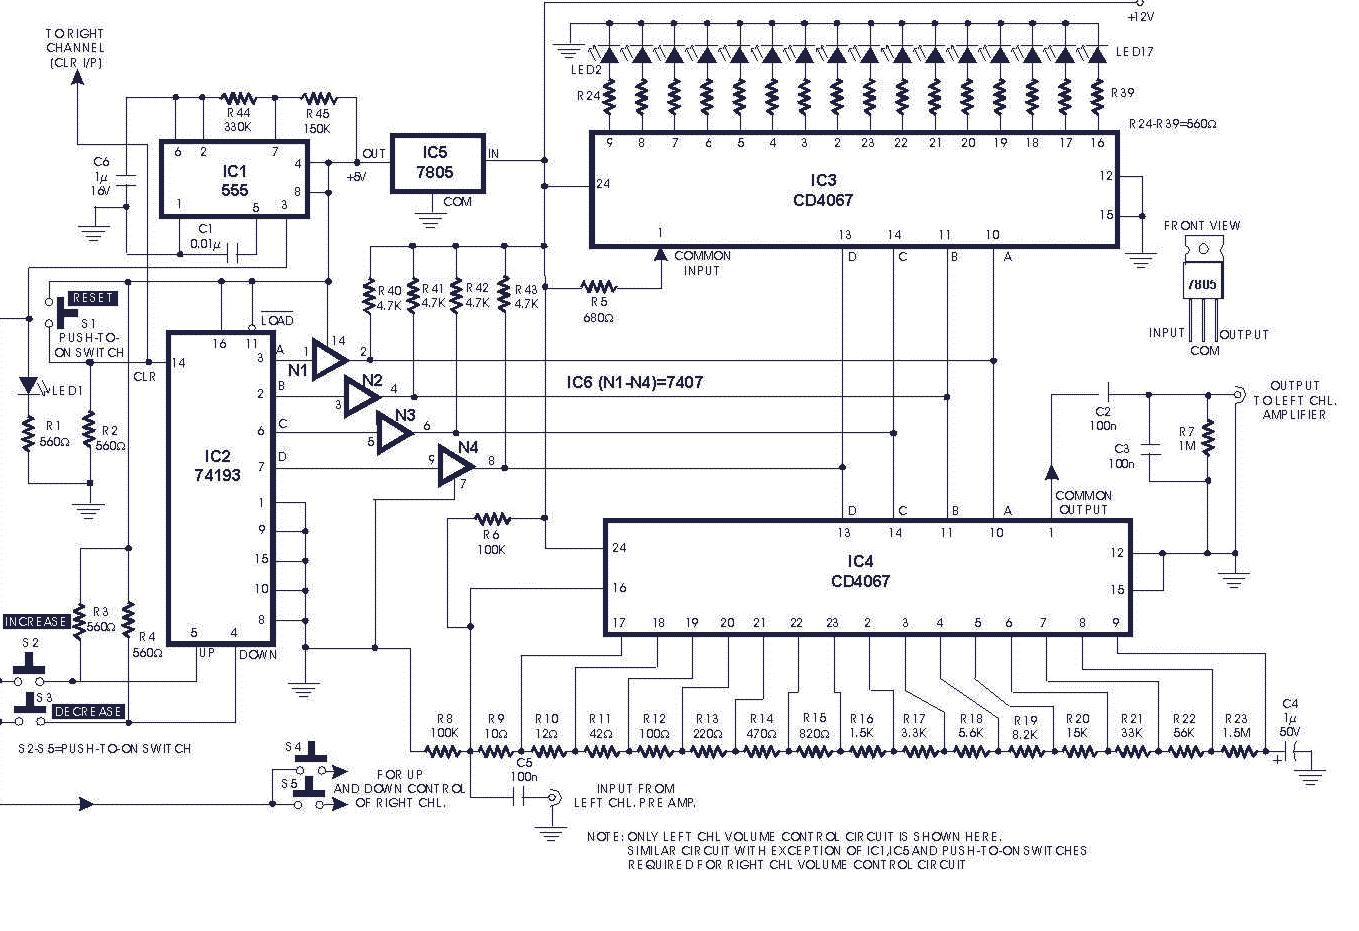 cat 5a wiring diagram pioneer avic n1 2 elektro fahriemjeblog page 14